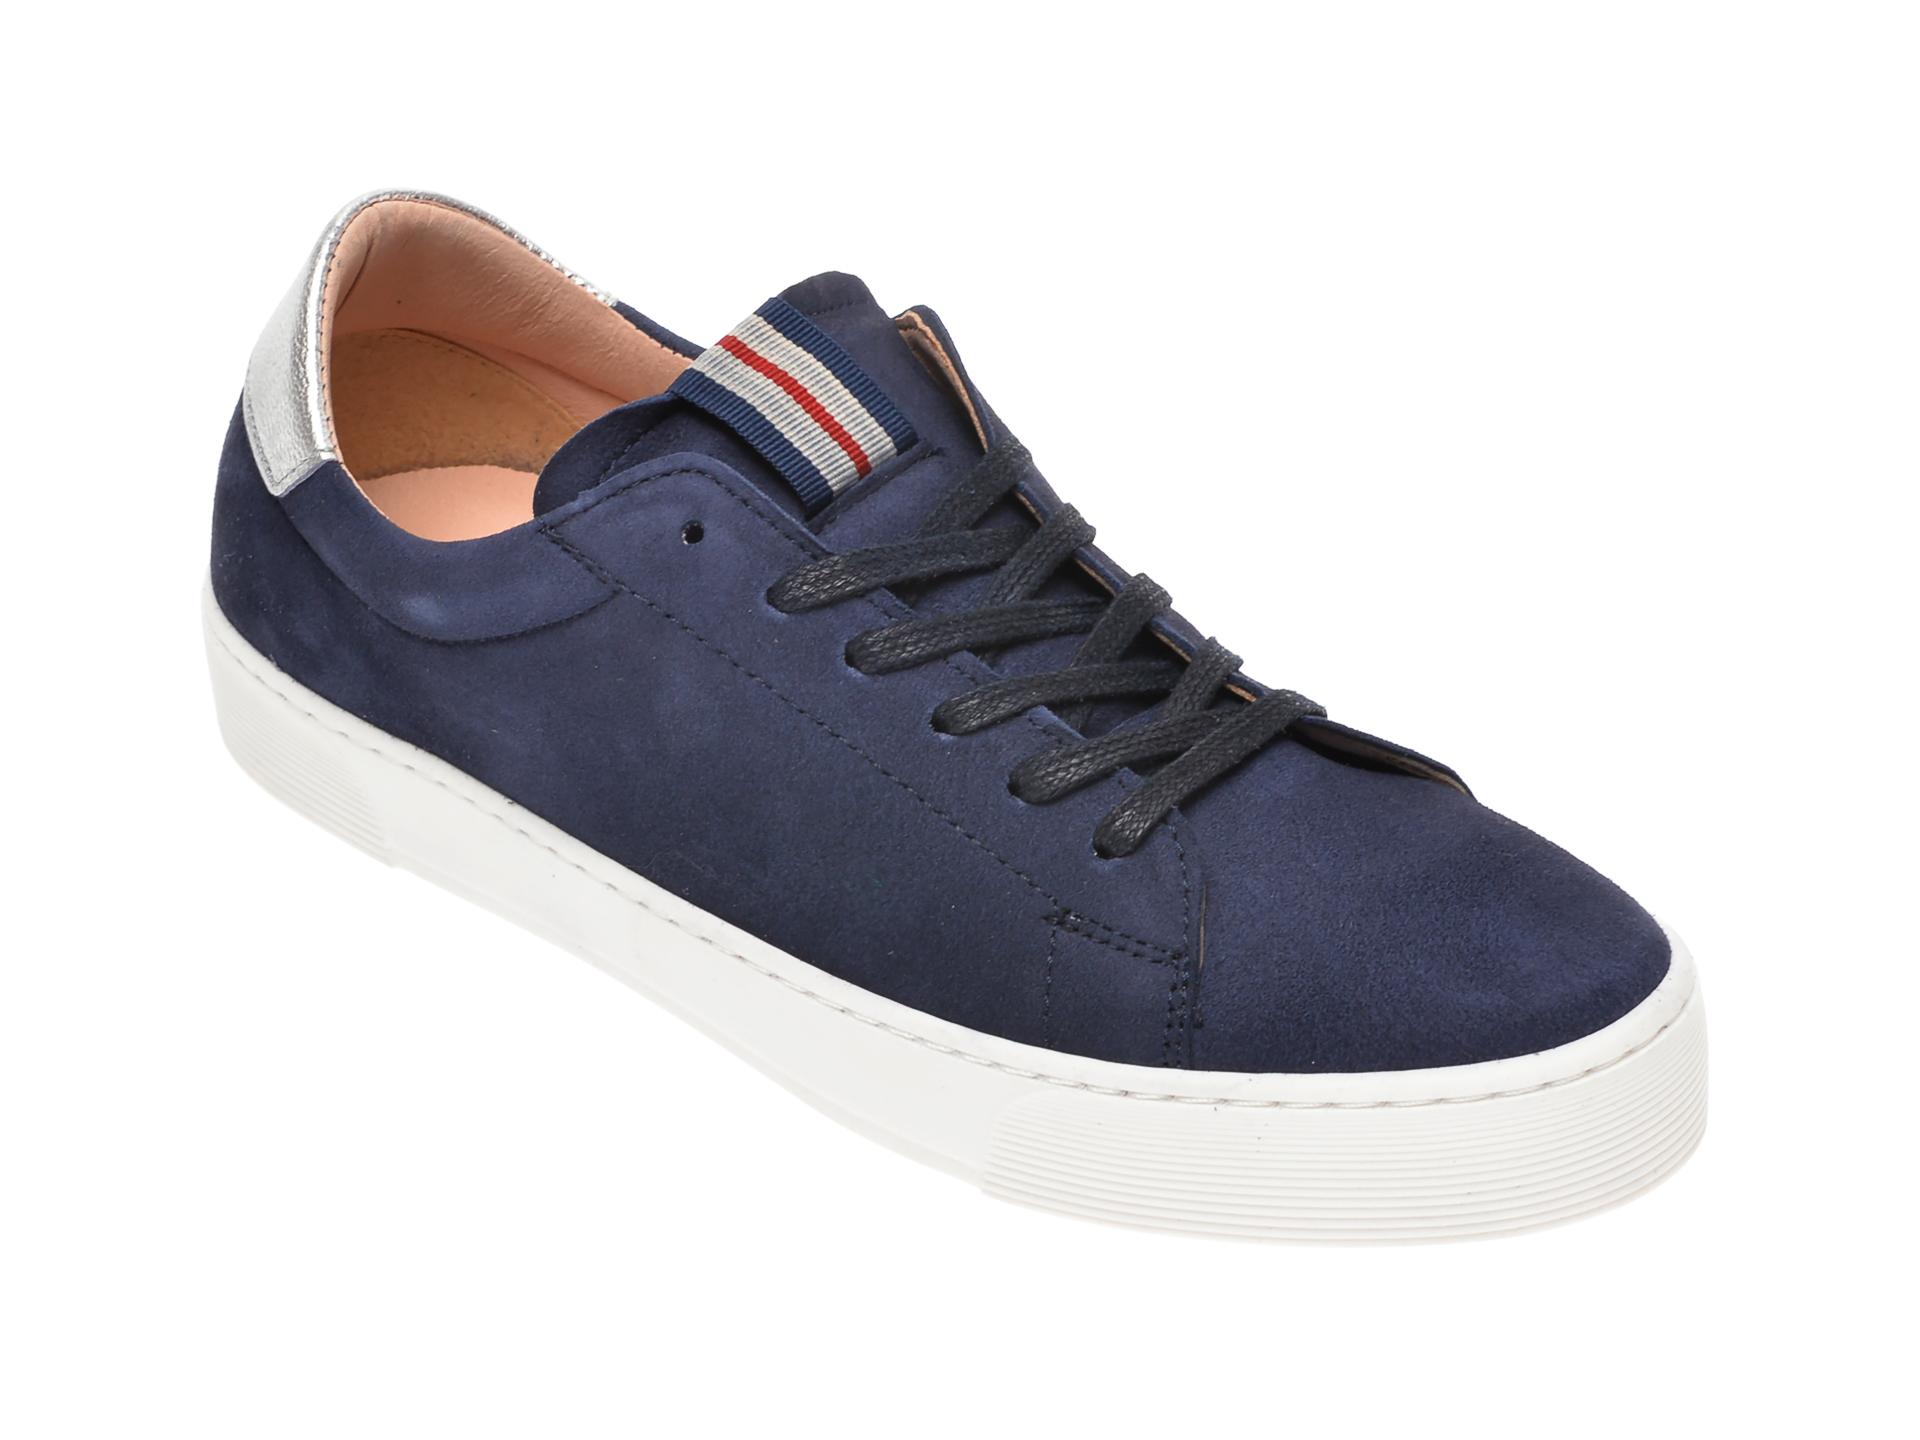 Pantofi sport SALAMANDER bleumarin, 55301, din piele intoarsa imagine